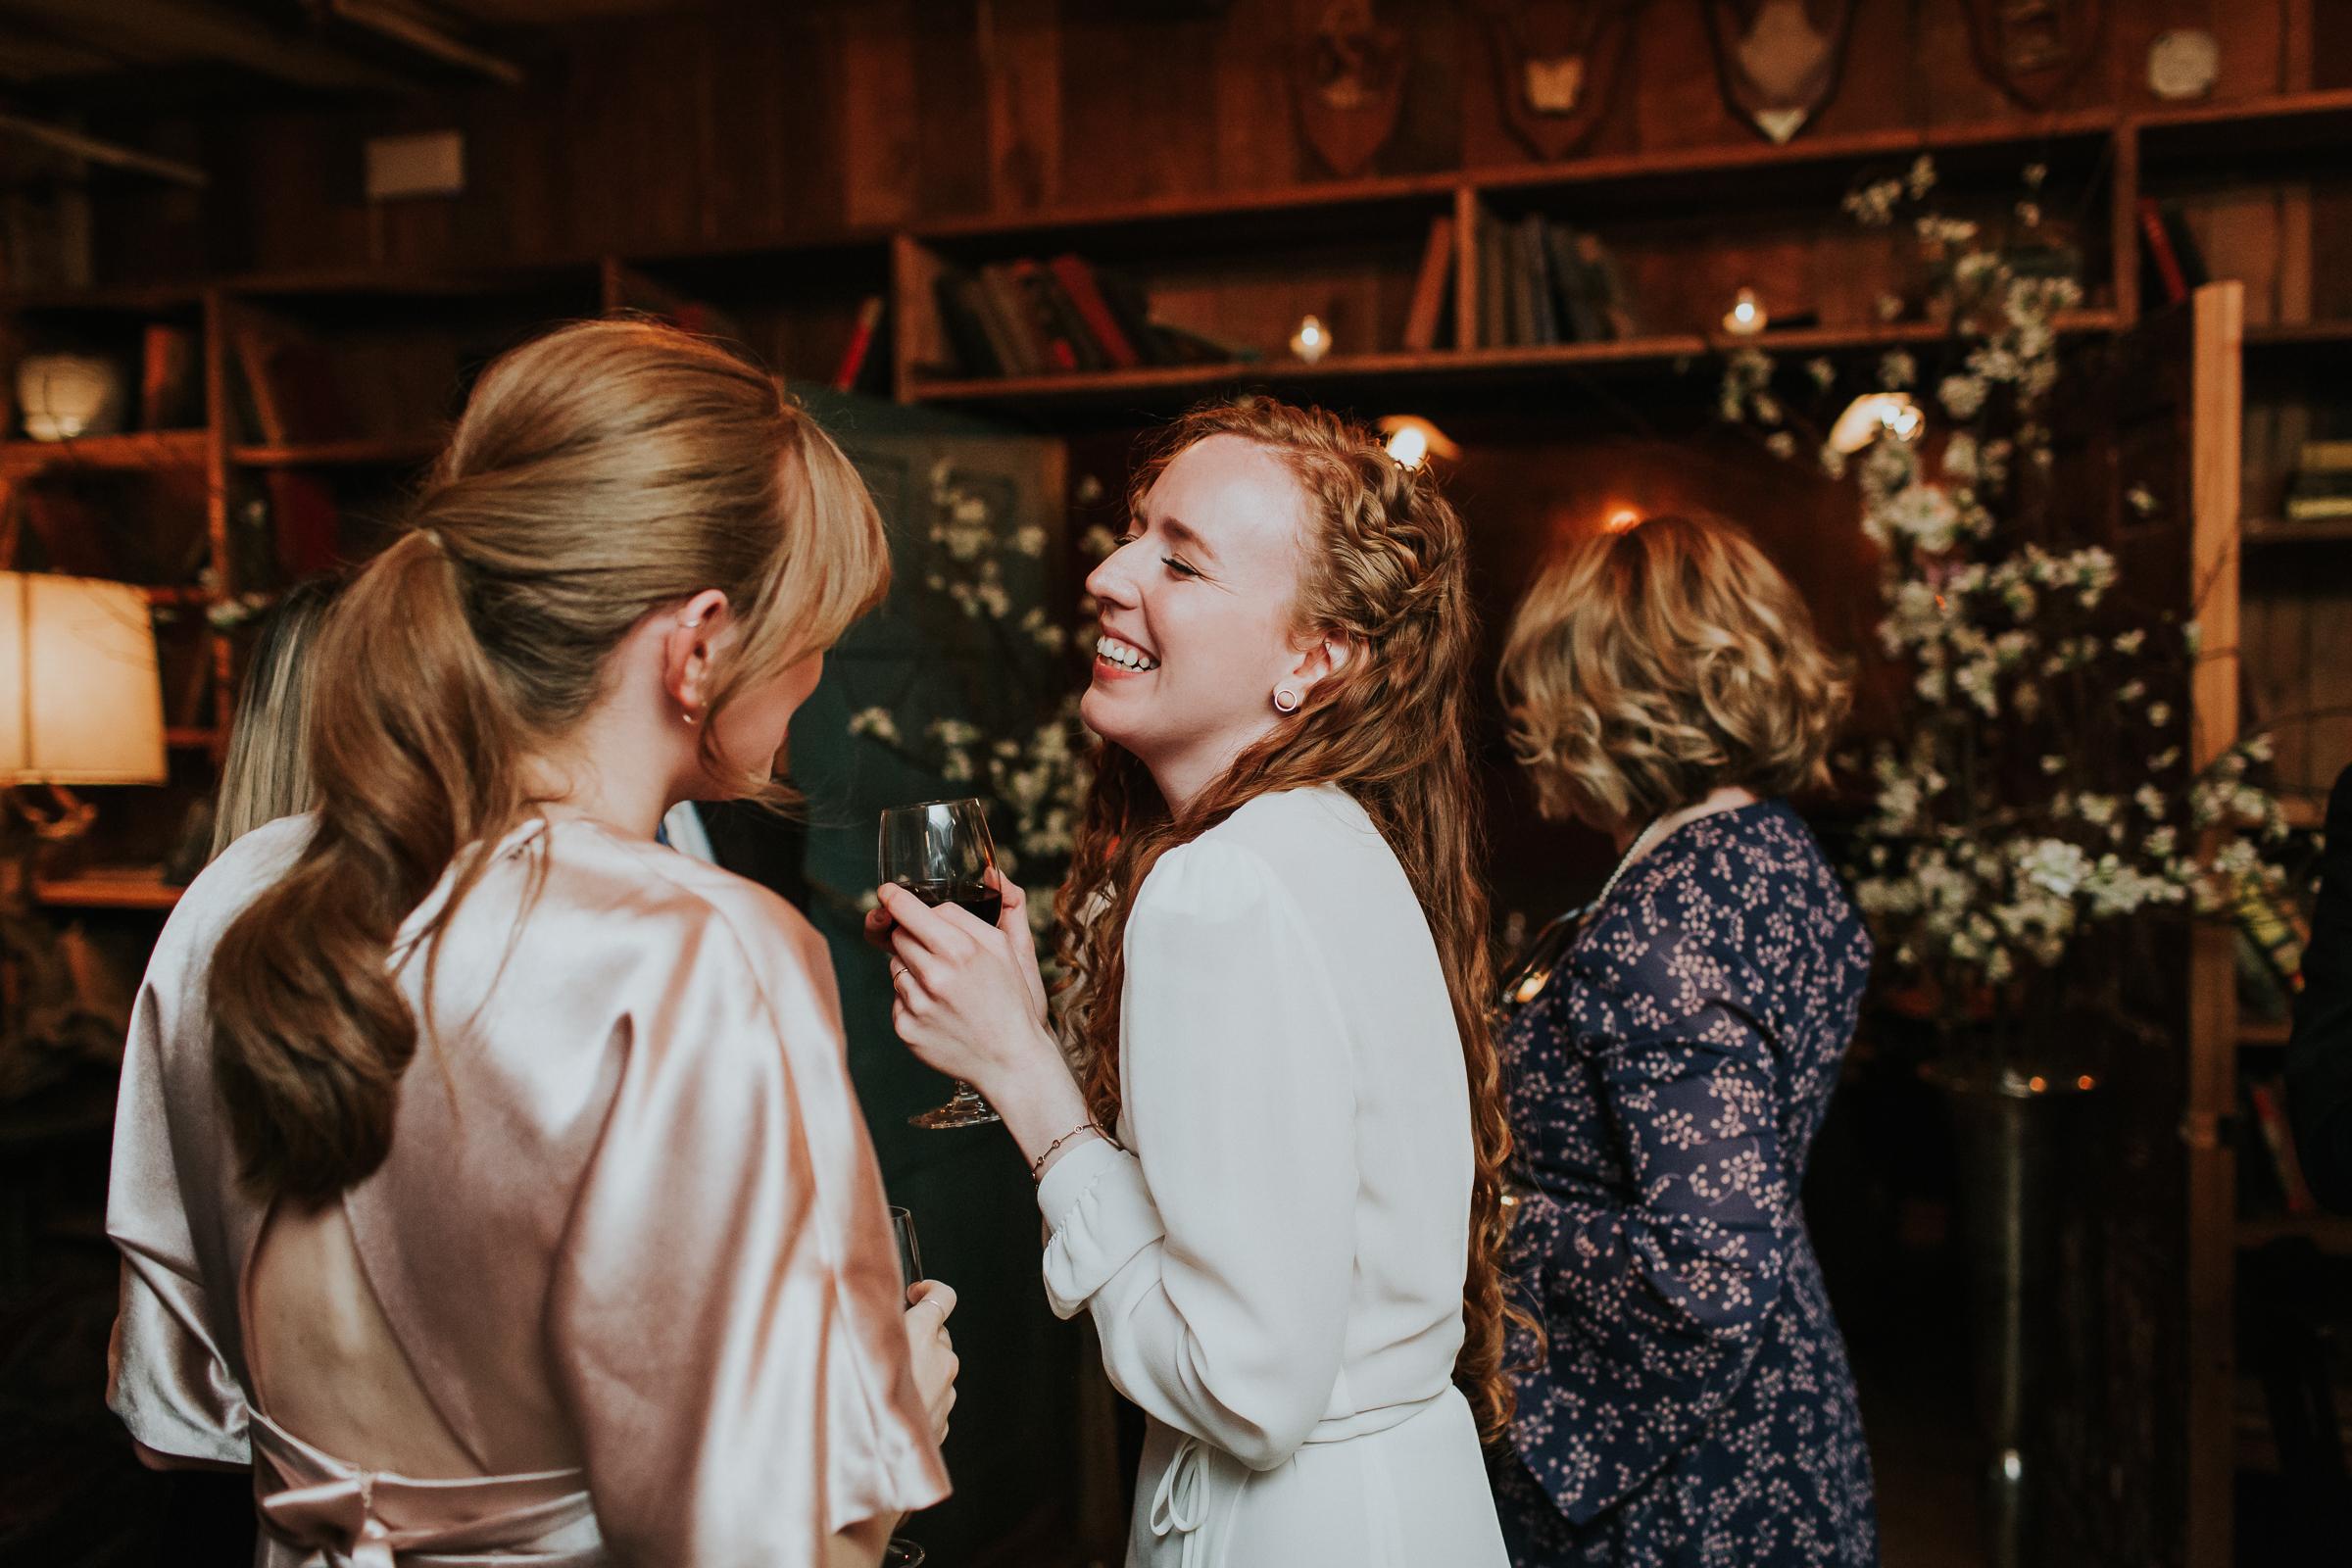 Freemans-Restaurant-Soho-Brooklyn-Bridge-Park-Dumbo-Documentary-Wedding-Photographer-55.jpg